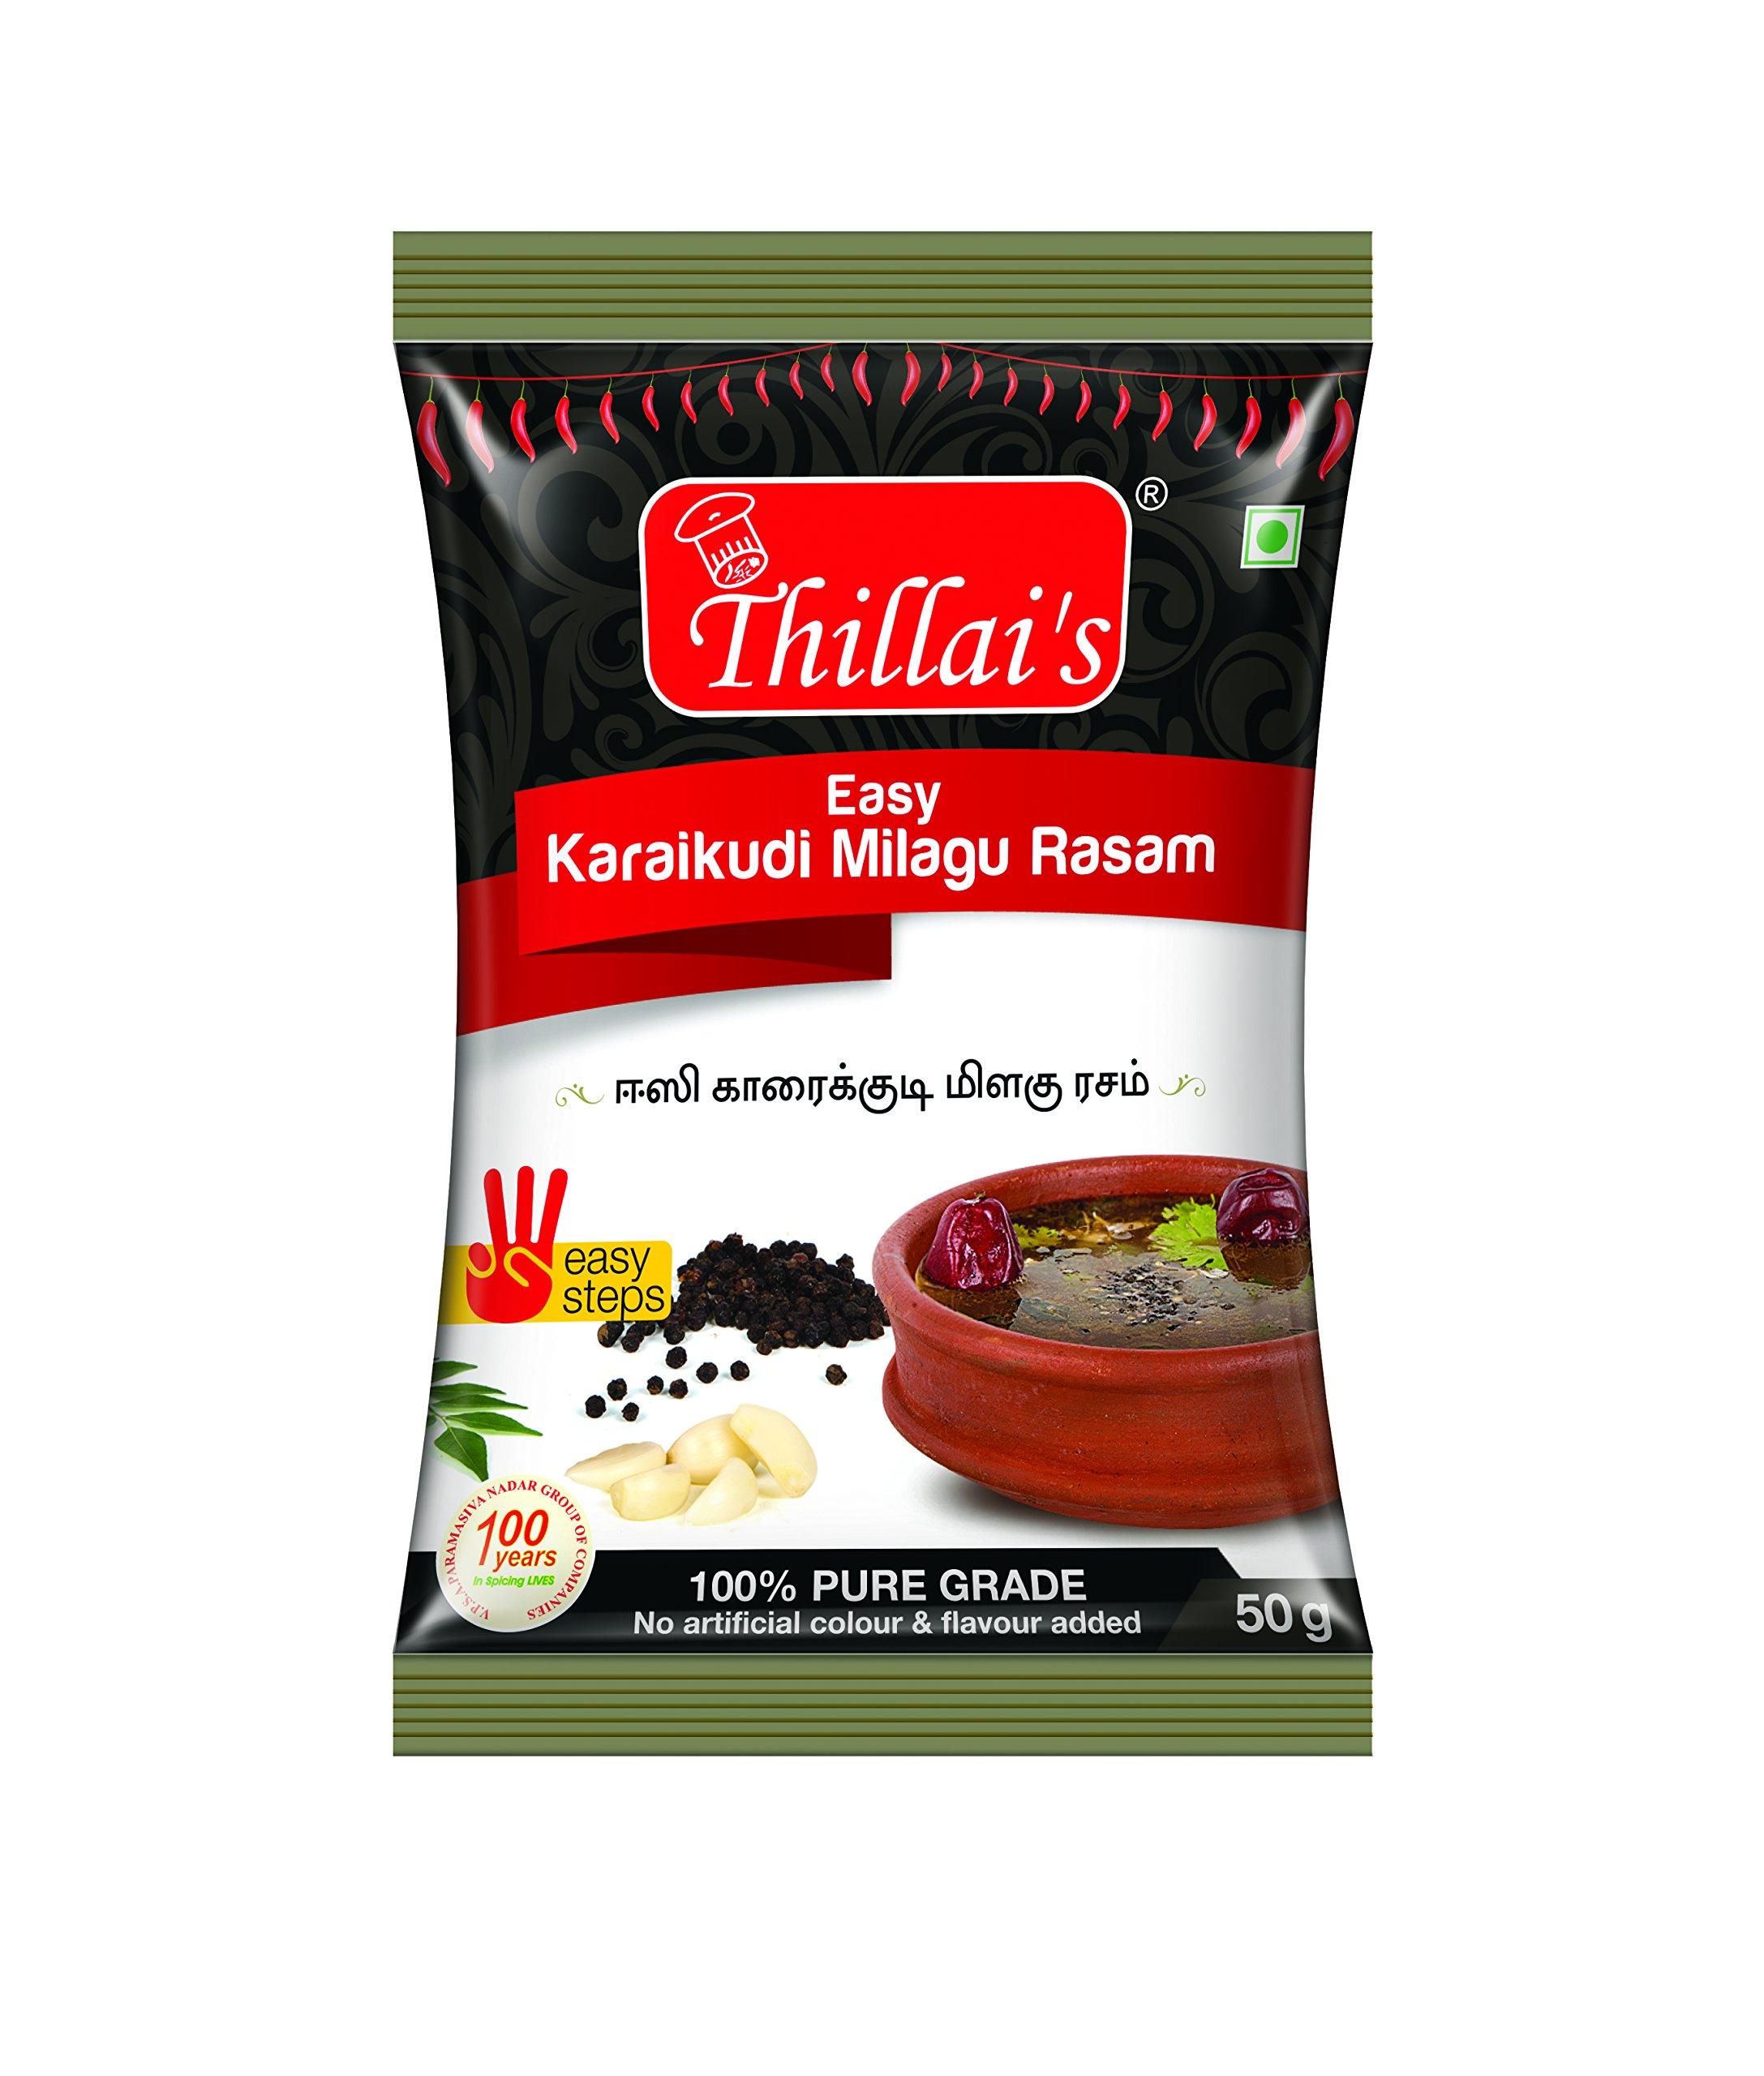 Thillais Easy Karaikudi Milagu Rasam-50g